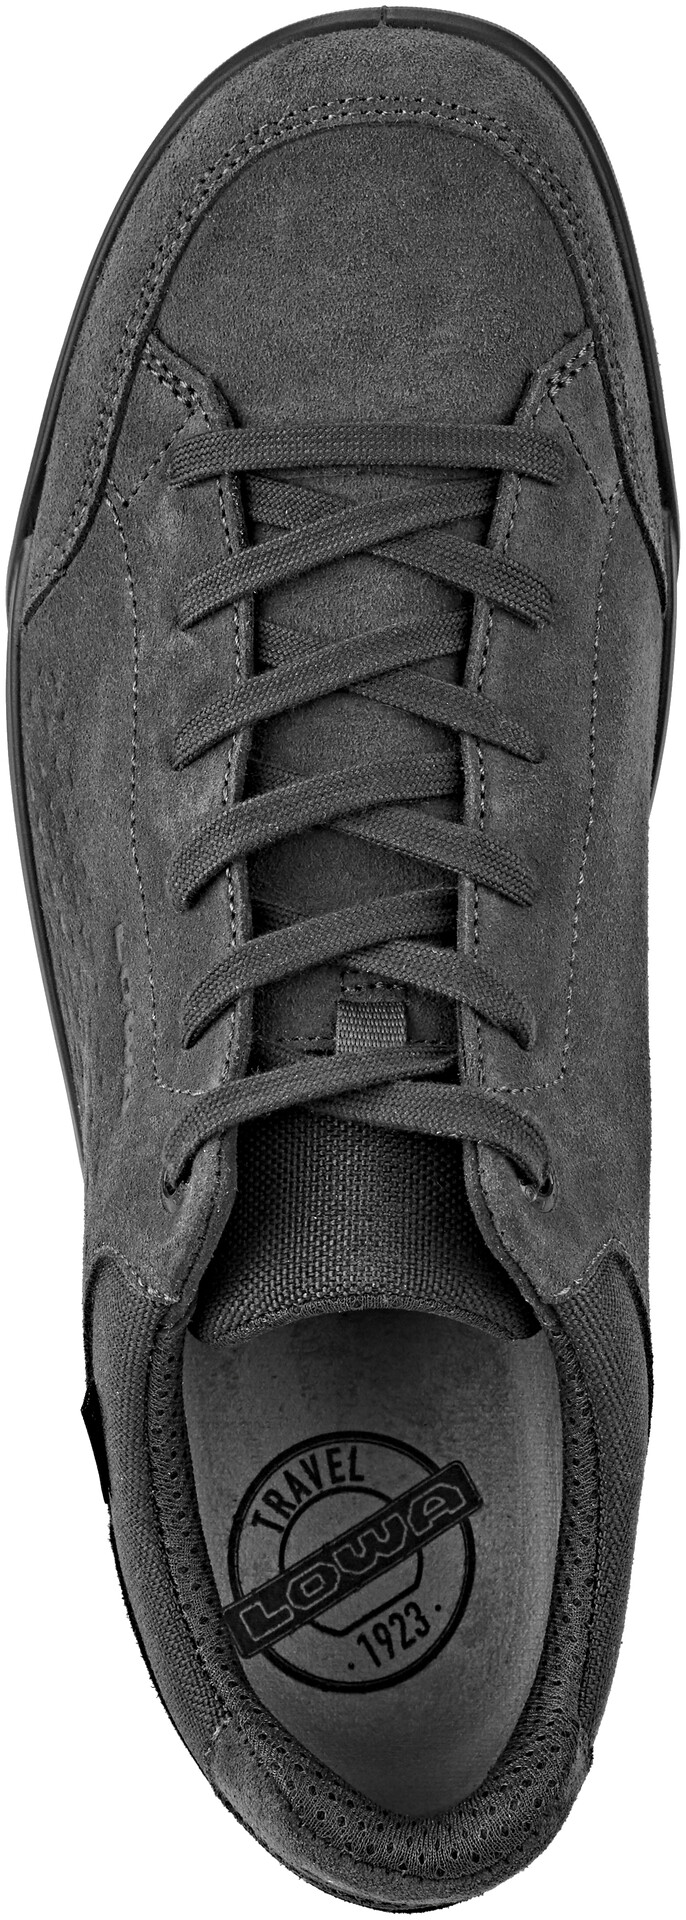 Sneaker Anthracite Lowa Lisboa Gtx Low Travel Men f7b6gIYyvm